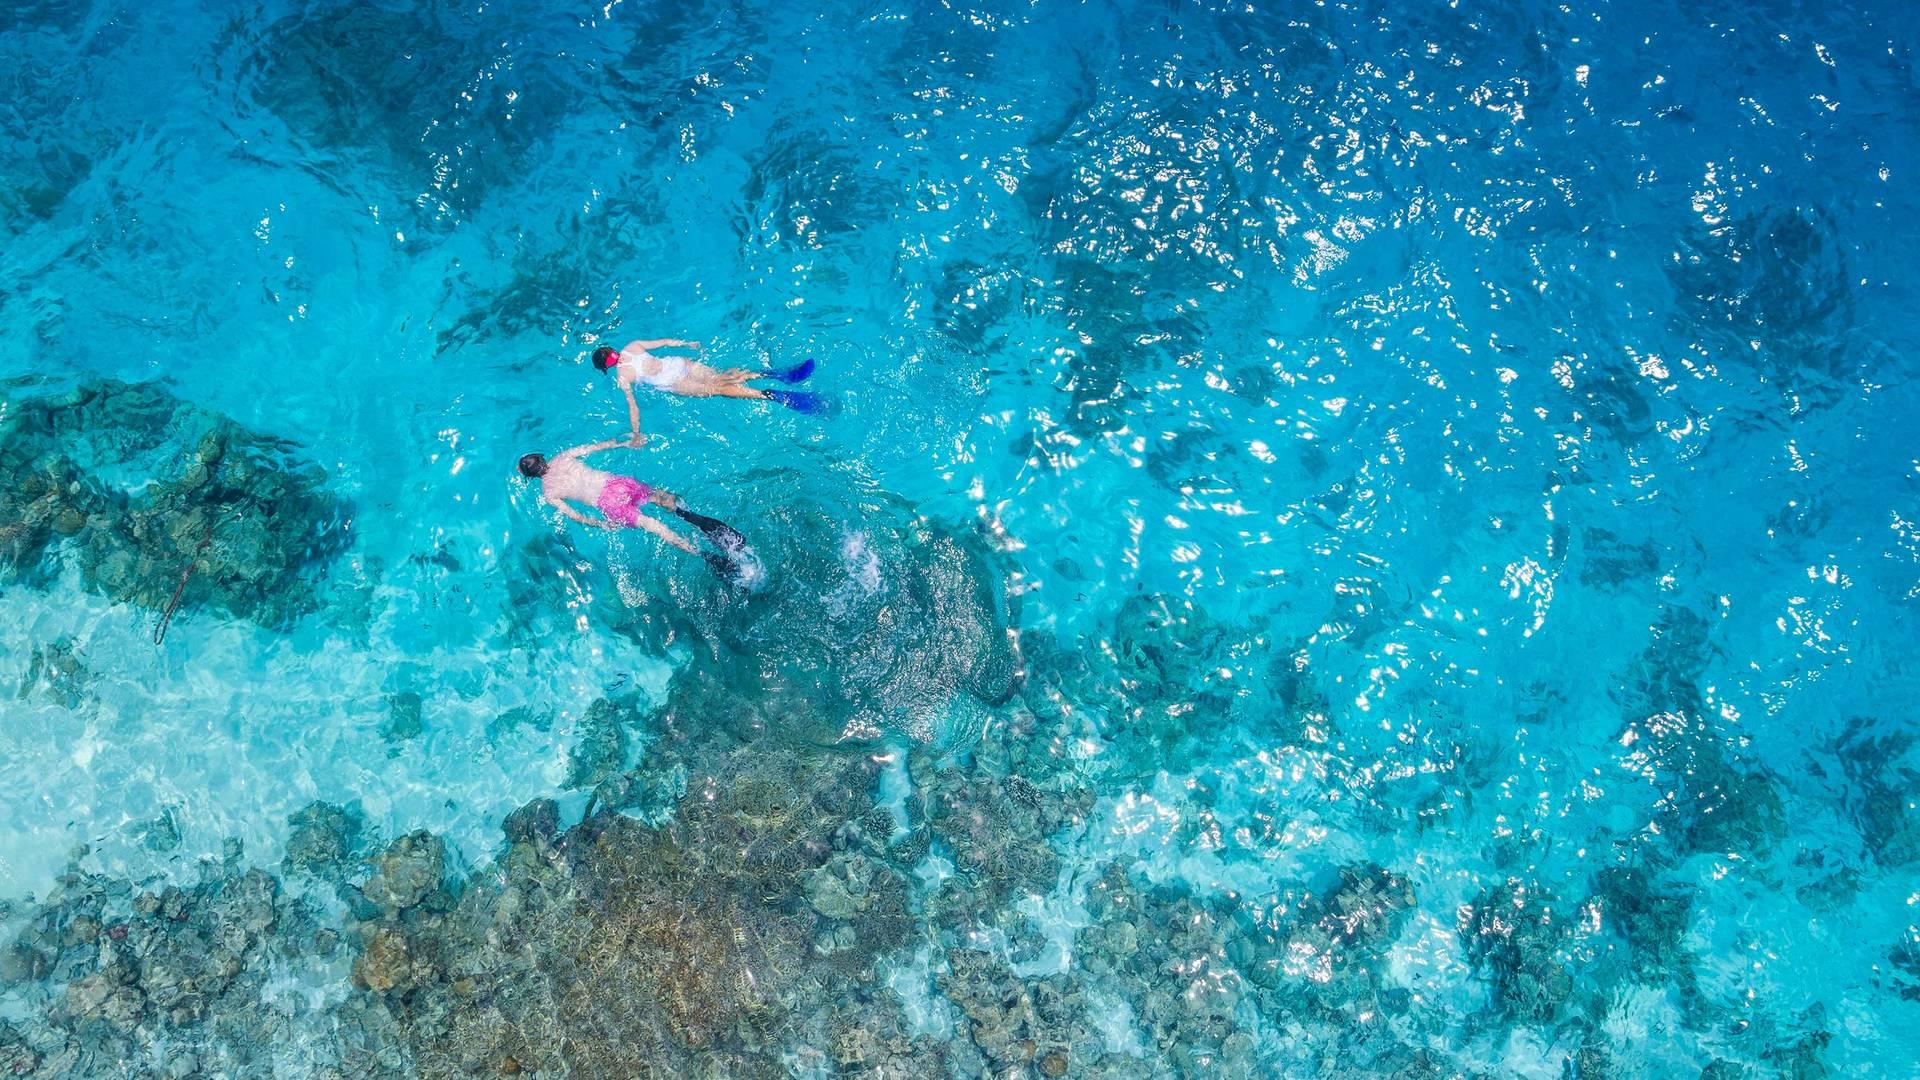 Couple snorkeling in the ocean